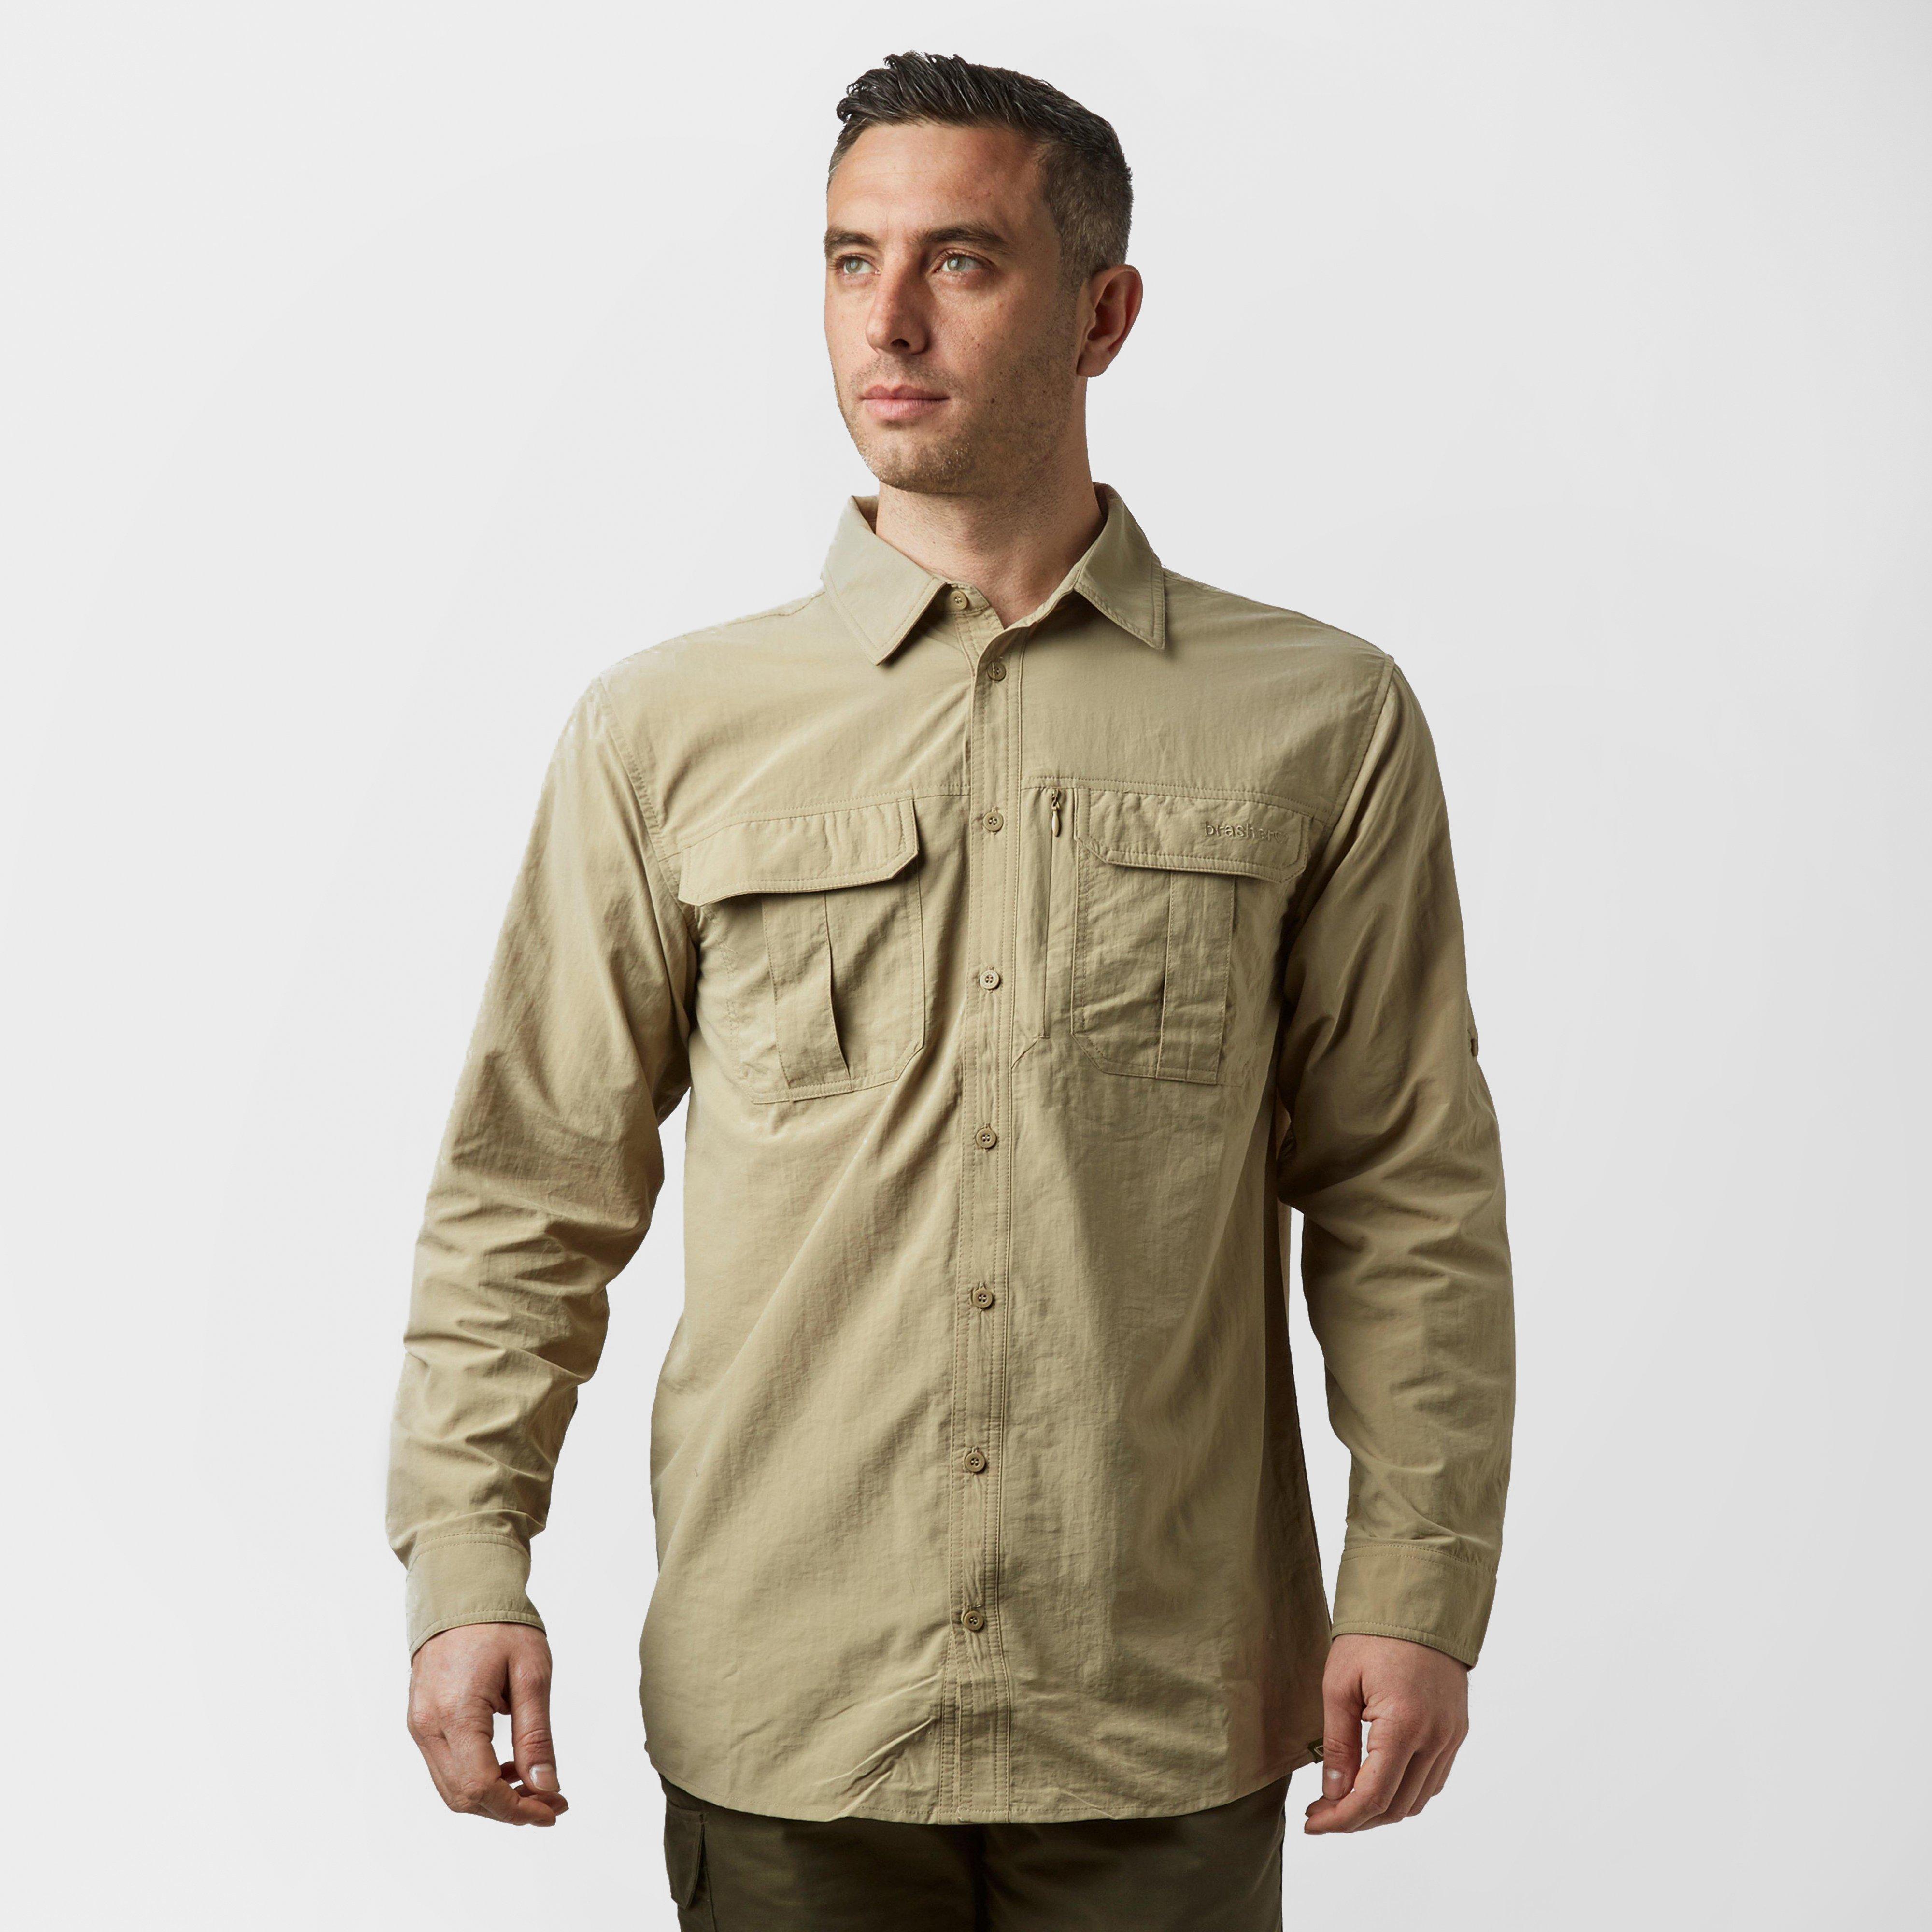 Brasher Brasher Mens Long Sleeve Travel Shirt - Brown, Brown